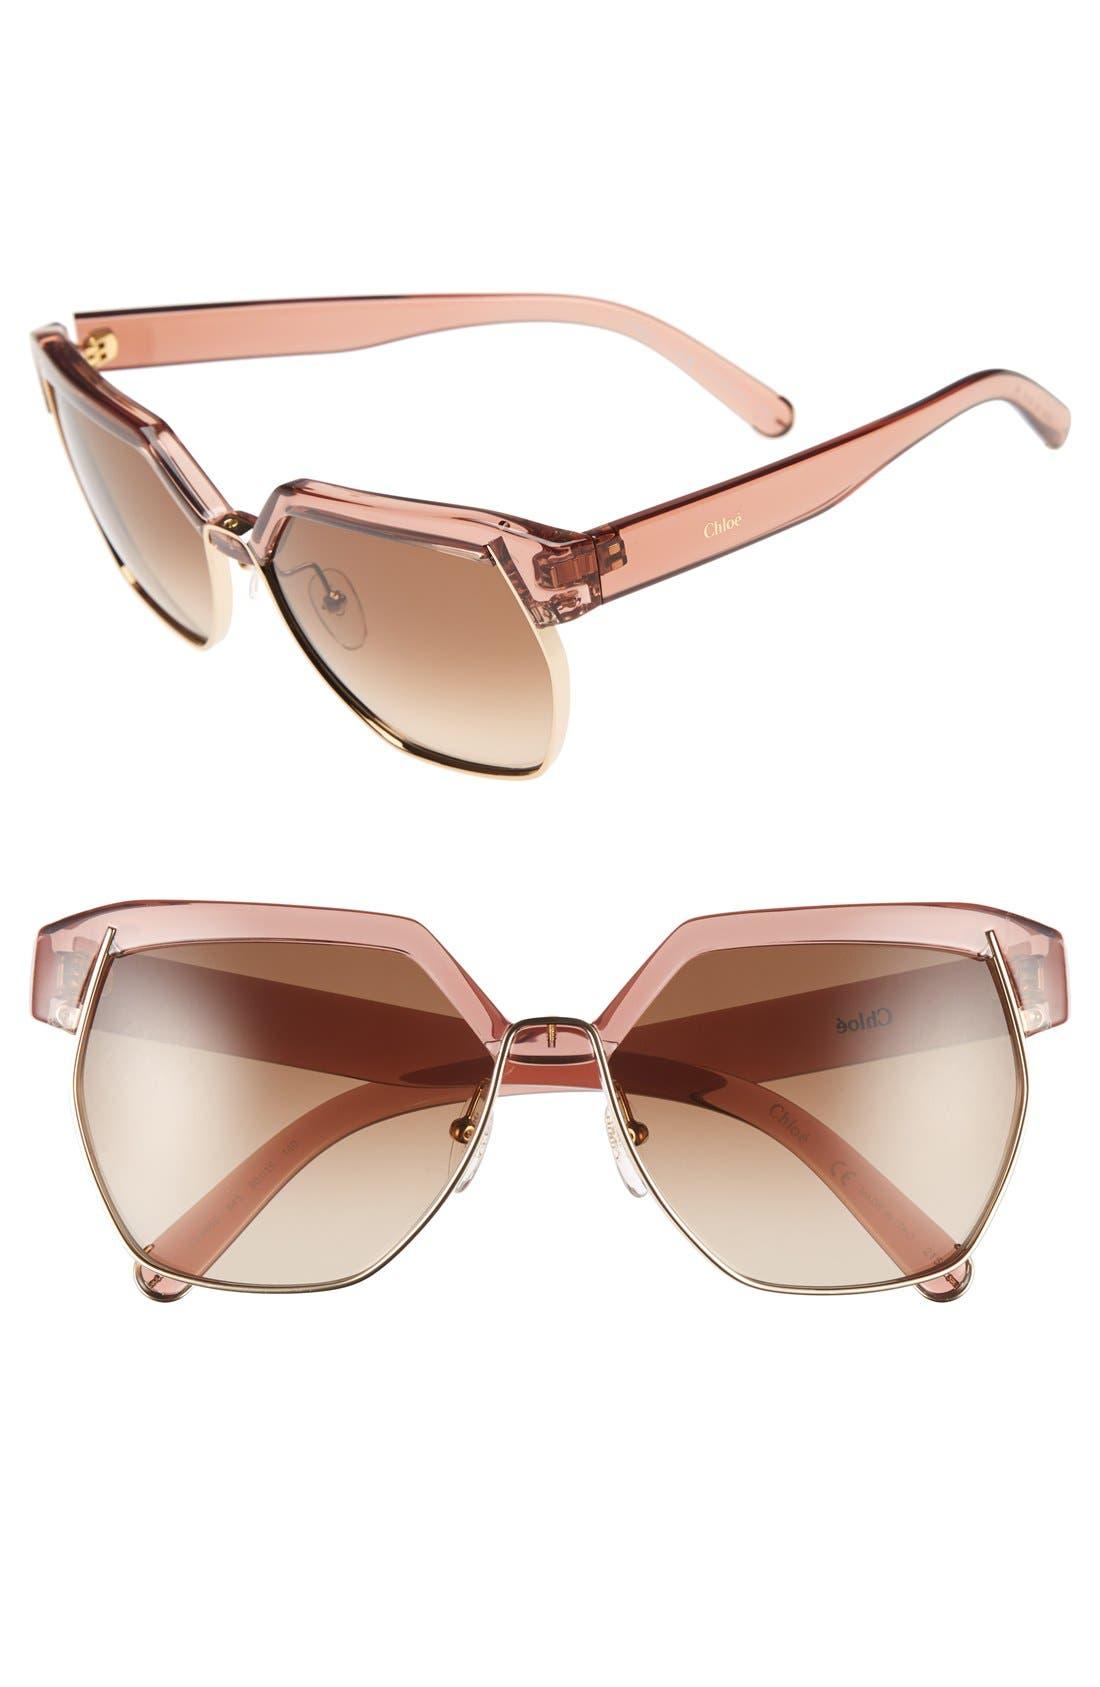 Alternate Image 1 Selected - Chloé 'Dafne ' 60mm Gradient Sunglasses